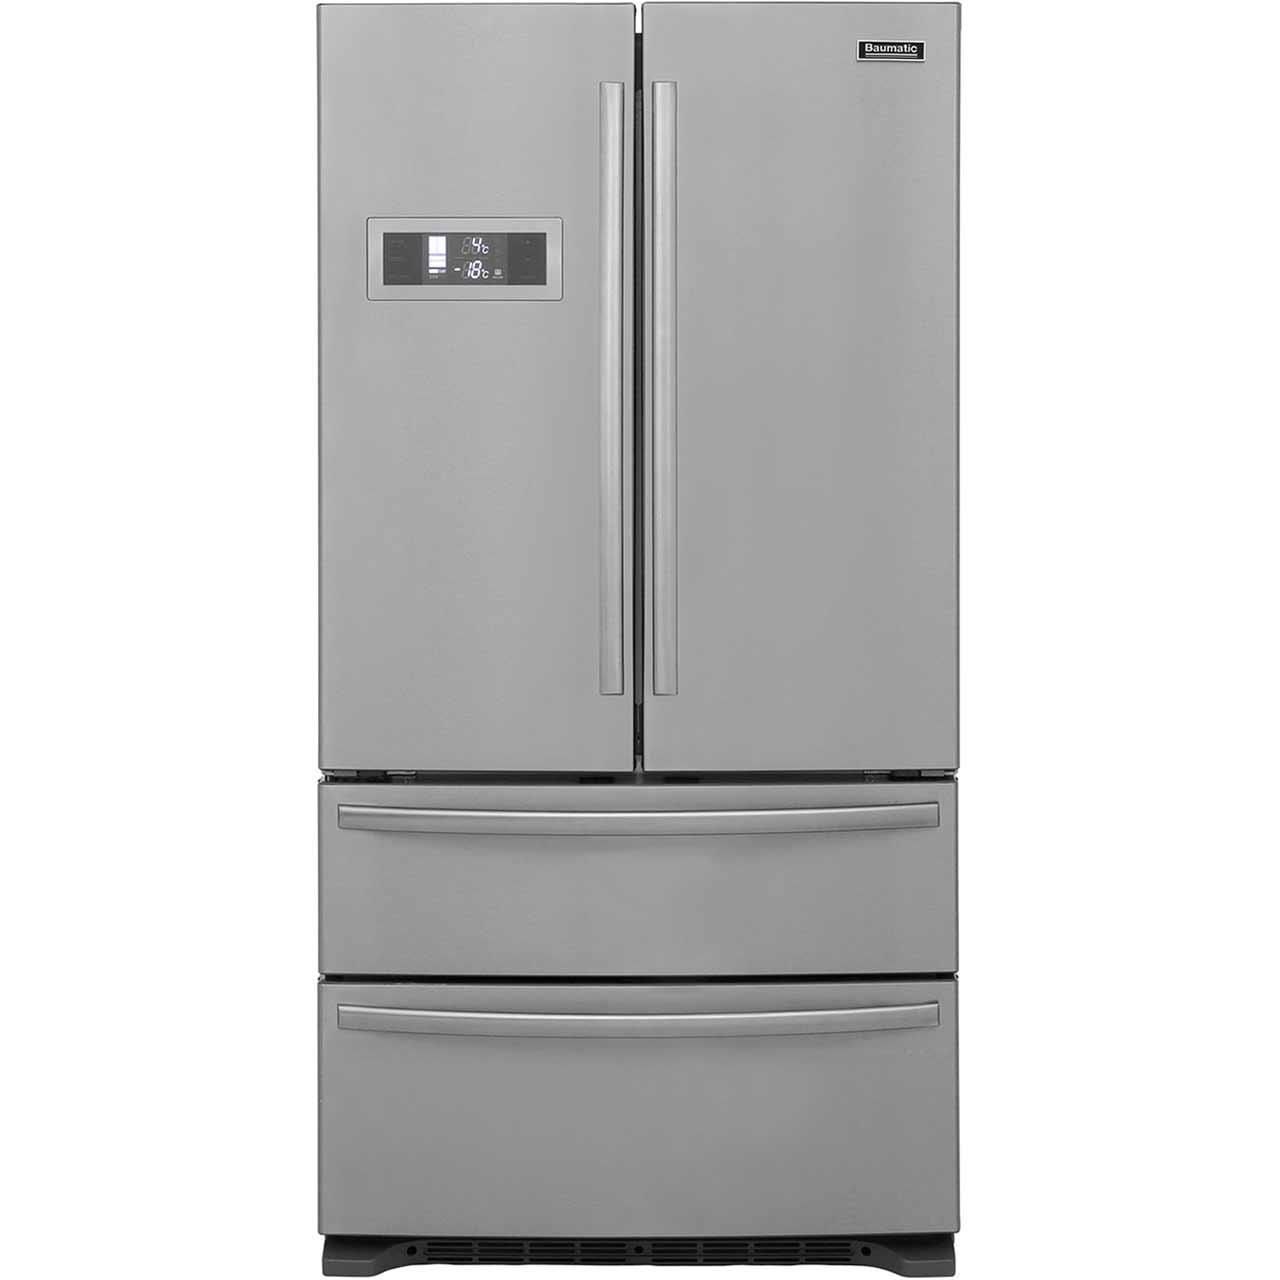 Baumatic B40DSS Free Standing American Fridge Freezer in Stainless Steel